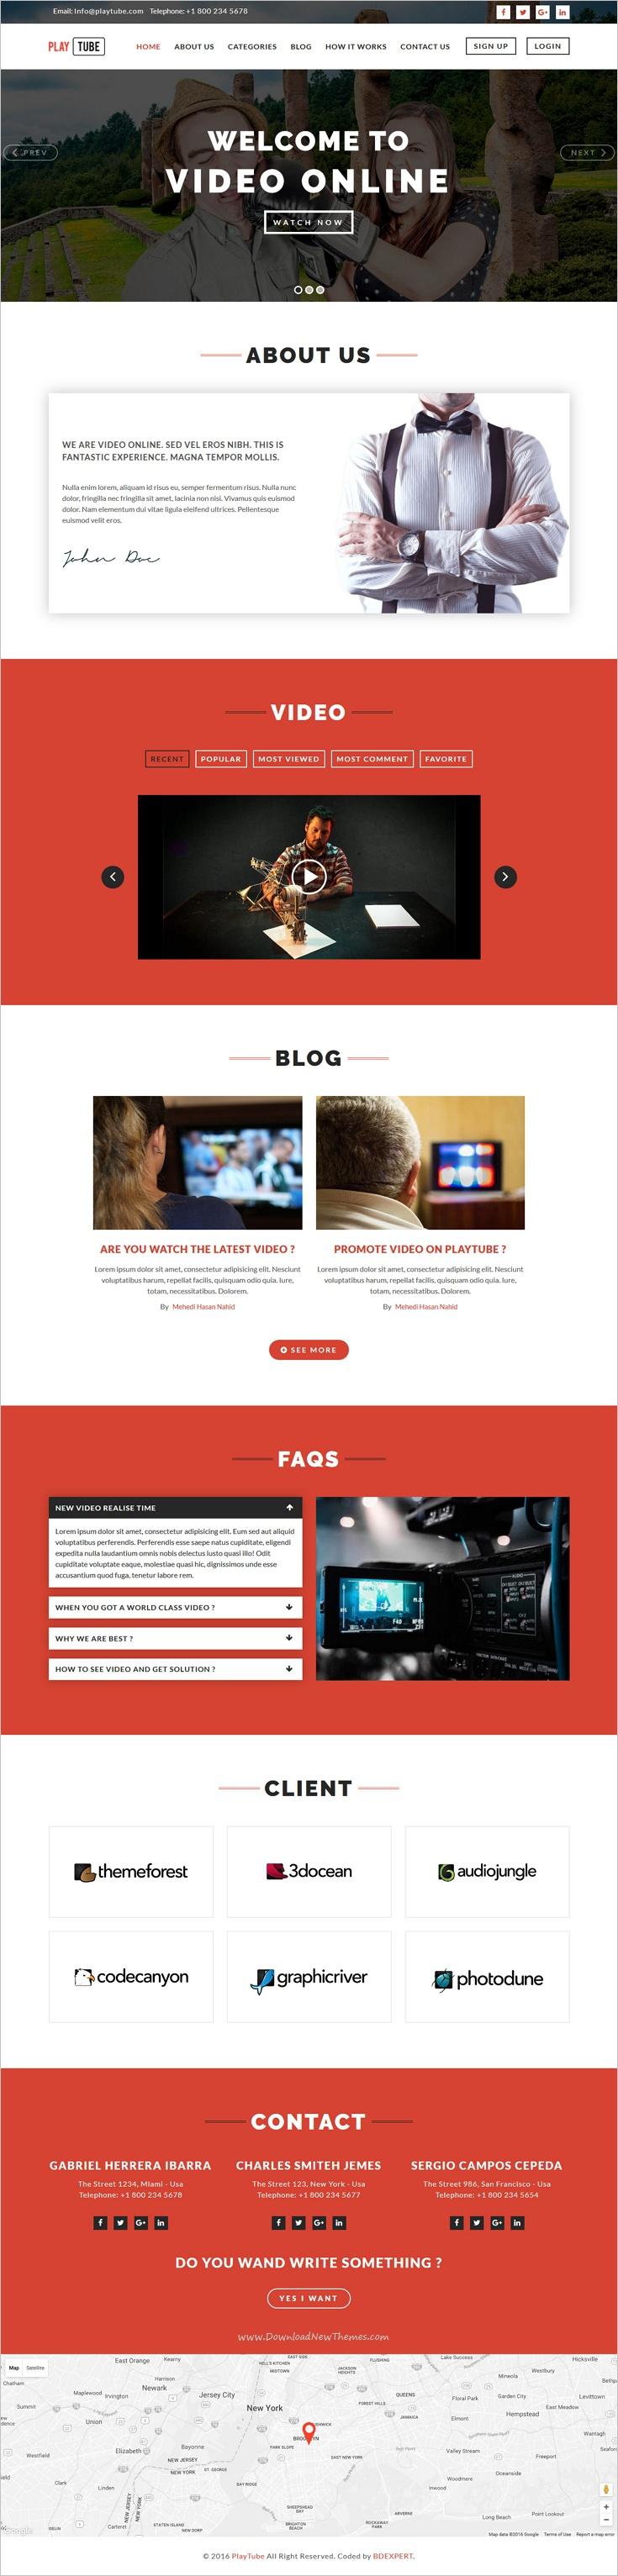 Playtube Video Blog Entertainment Template Website Template Templates Web Design